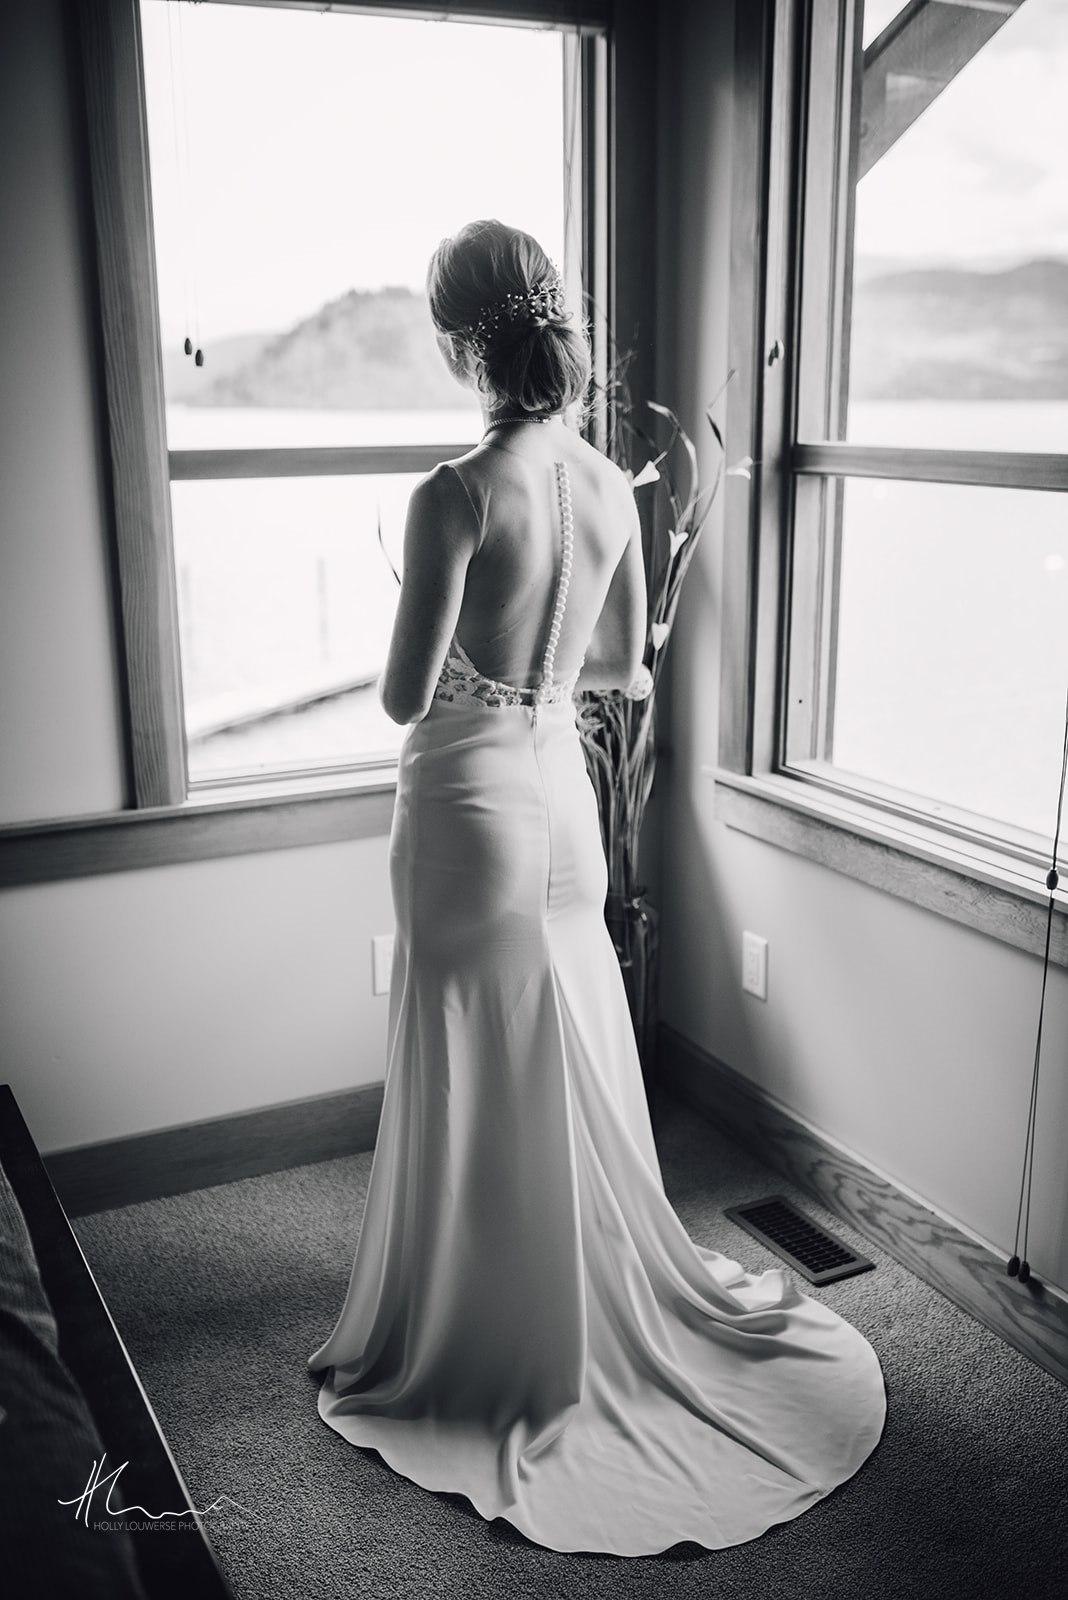 Holly Louwerse Photography